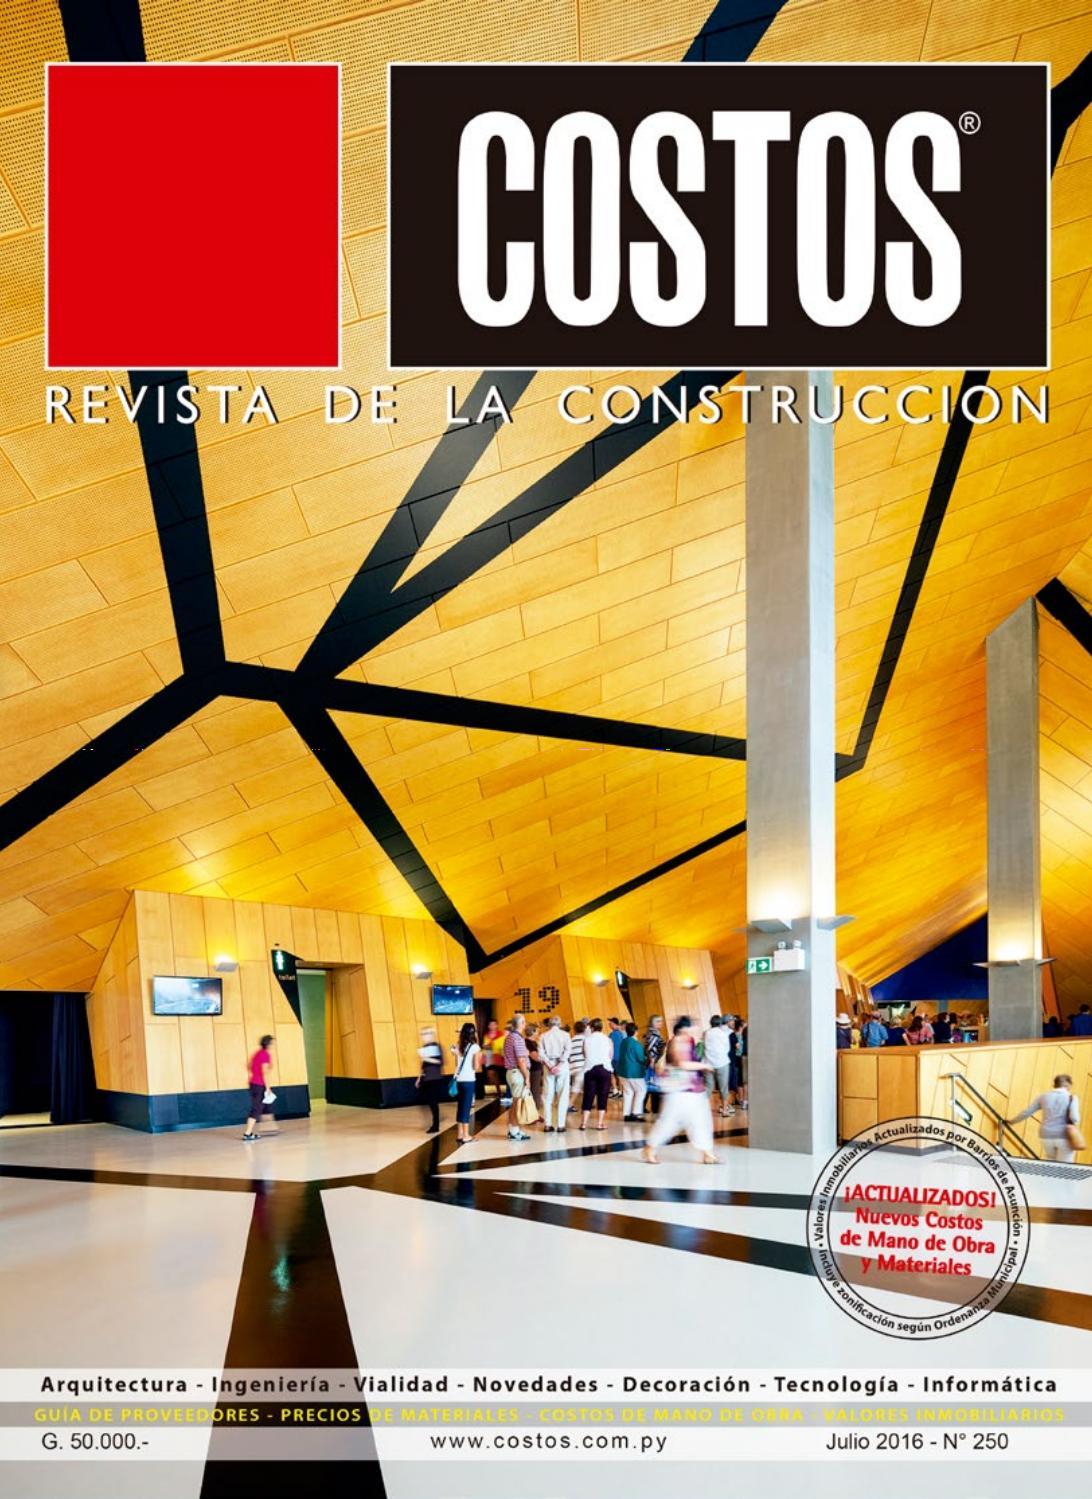 Costos 250 Julio/2016 by Revista Costos (Paraguay) - issuu